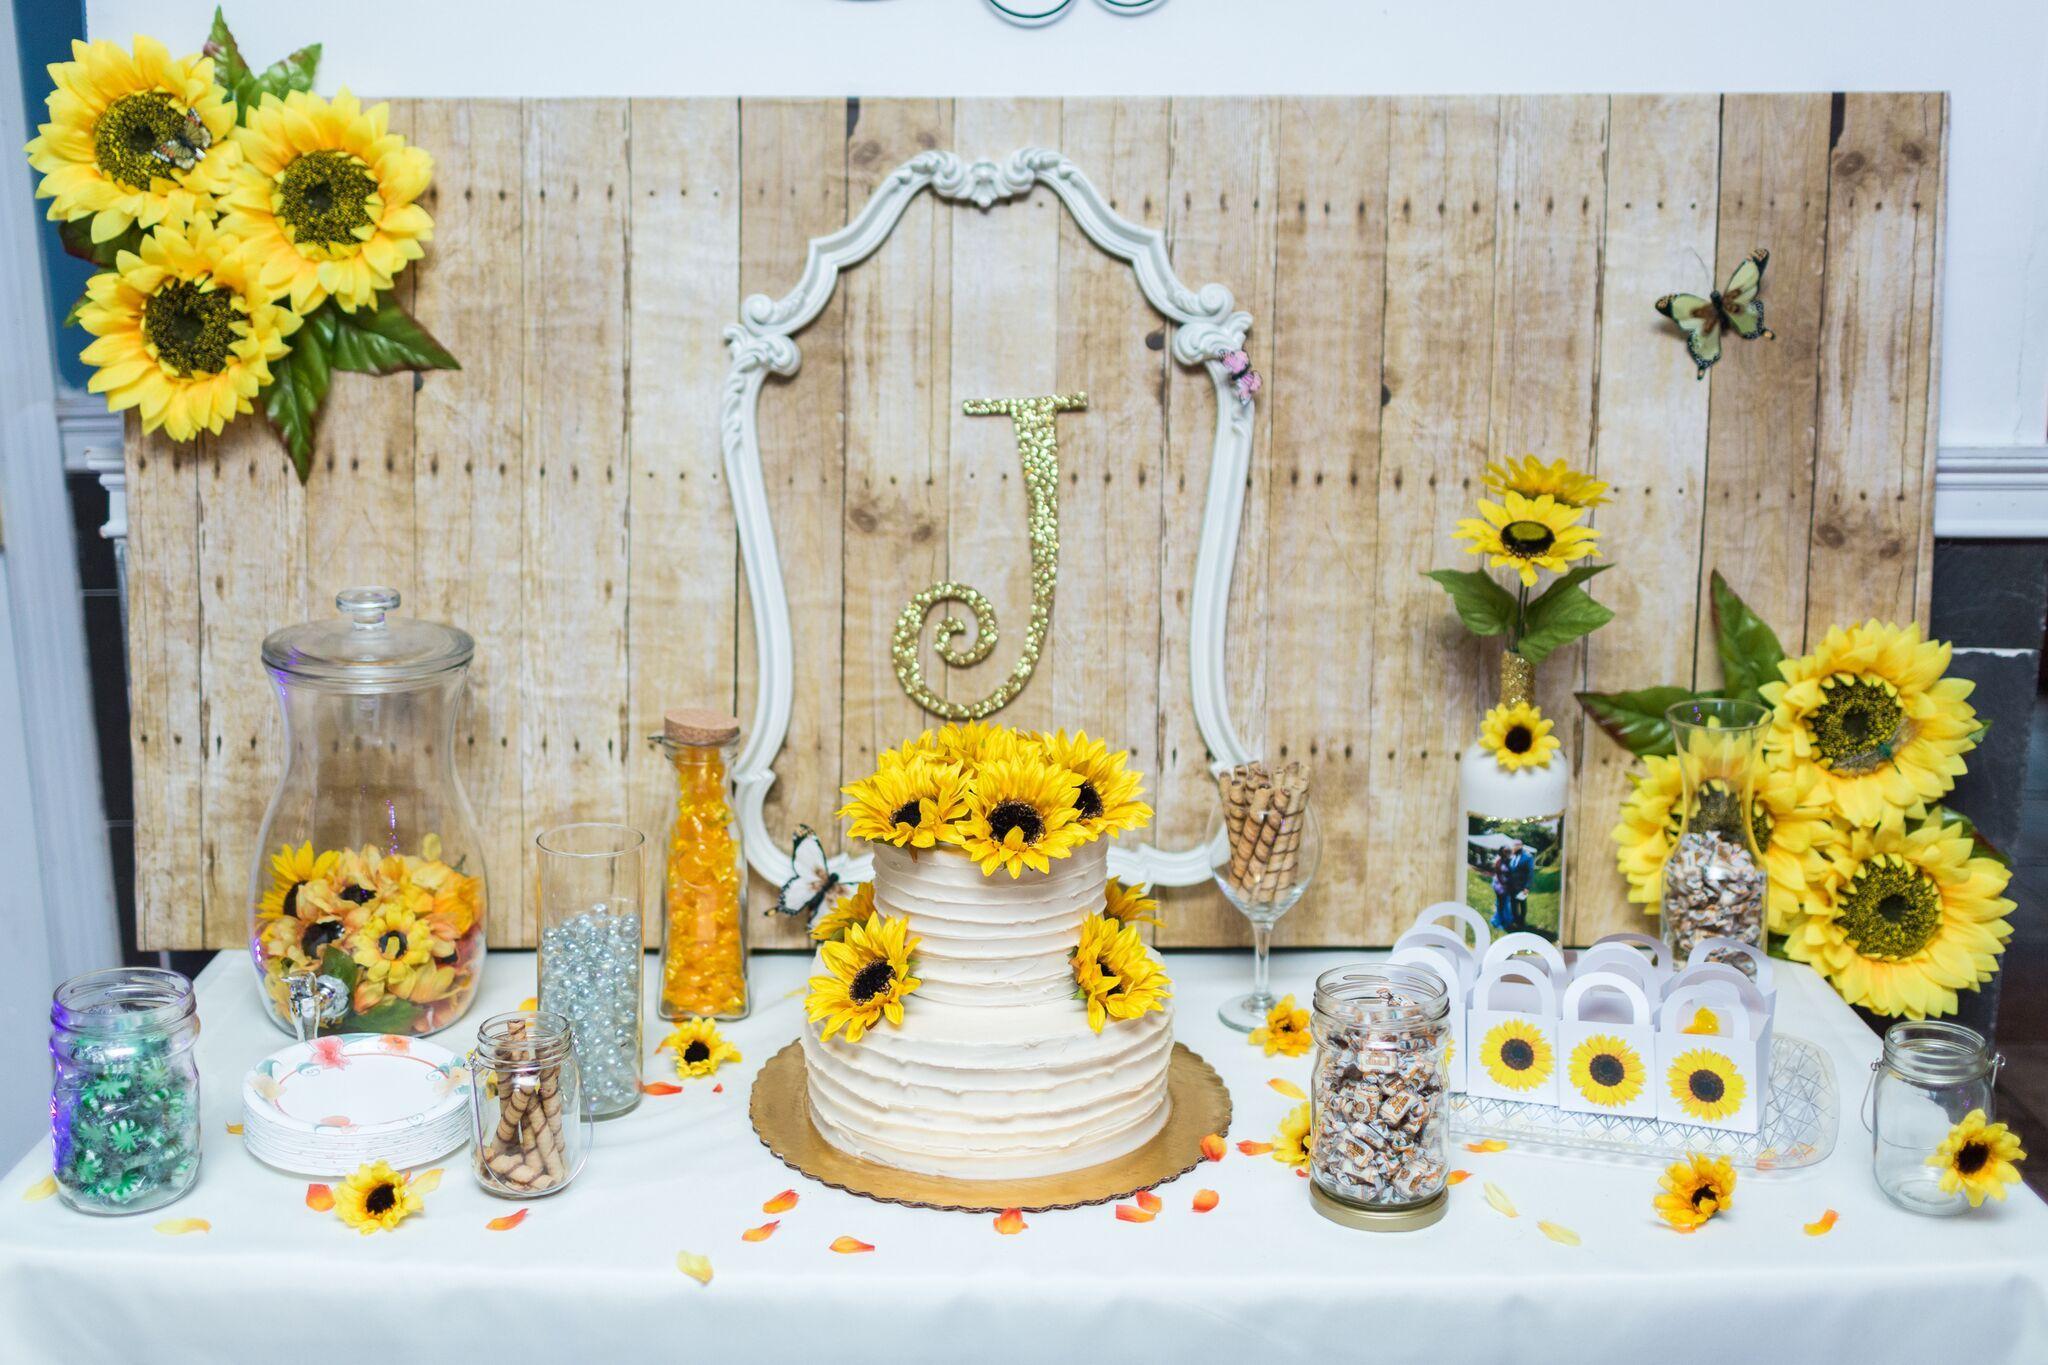 Sunflower Cake Table 🌻🎂 Upcycle Frame / Weathered Wood